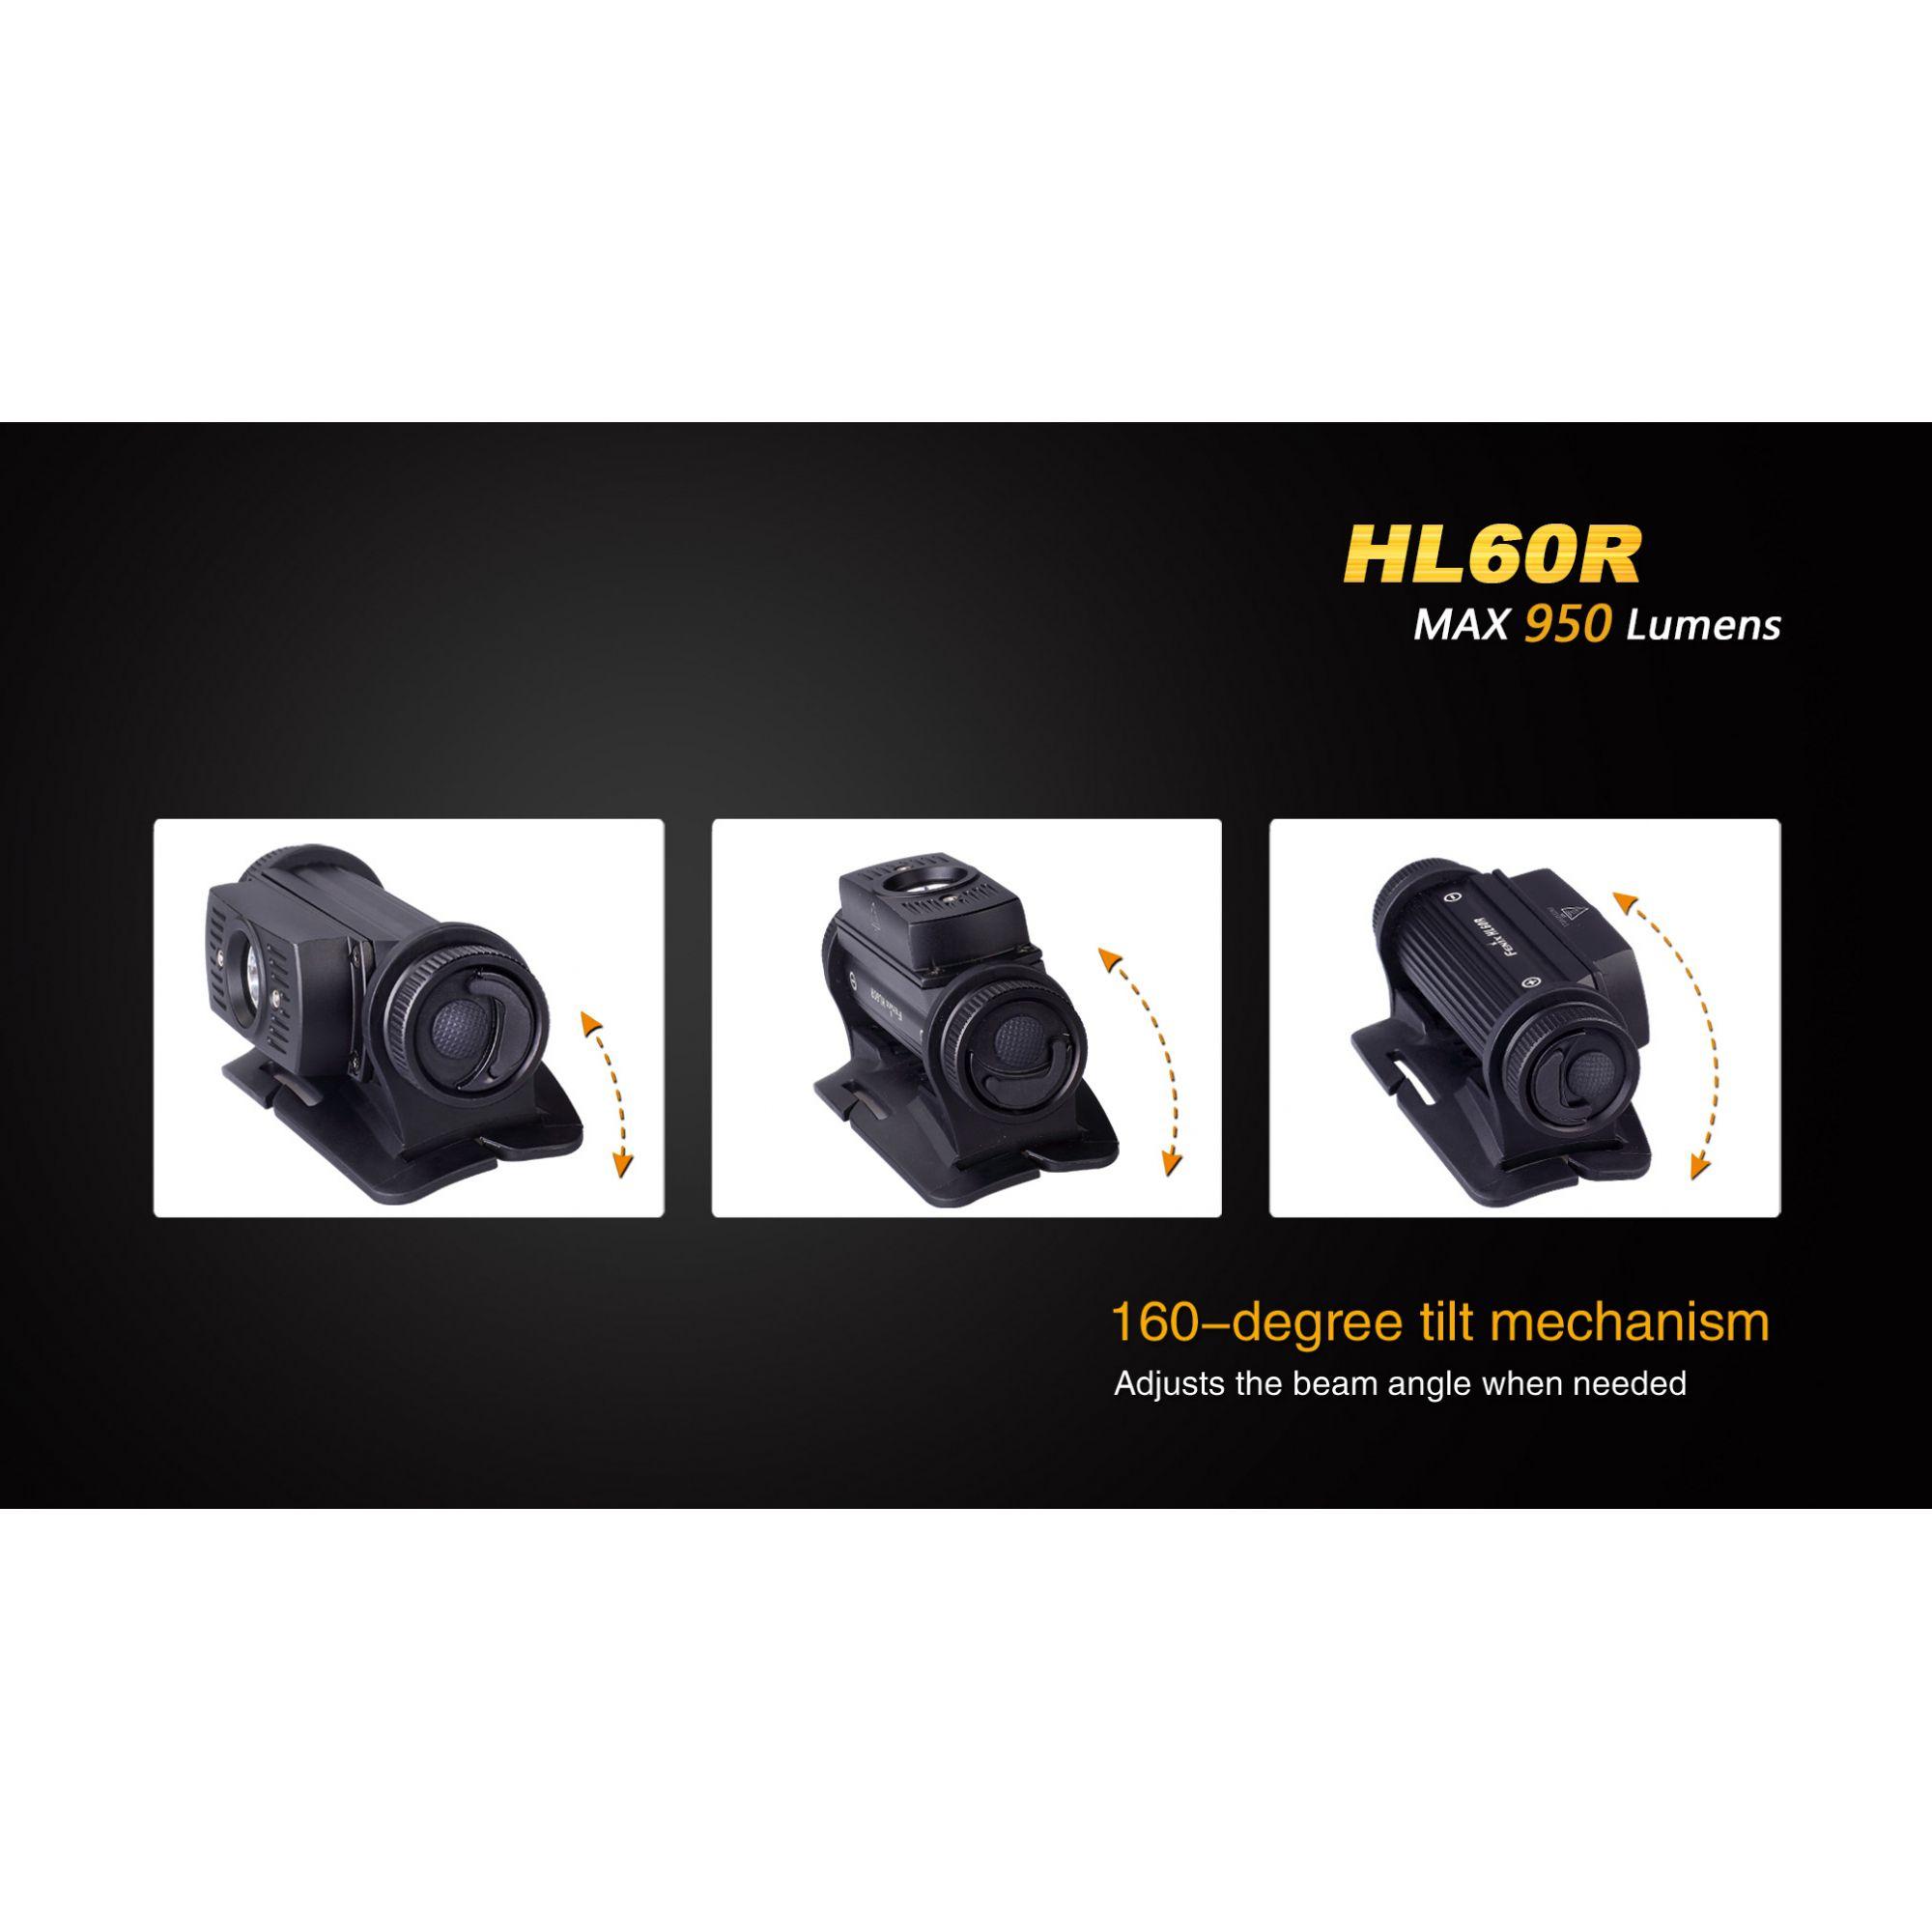 Lanterna Fenix HL60R Black - Alcance Até 116m - 950 lúmens